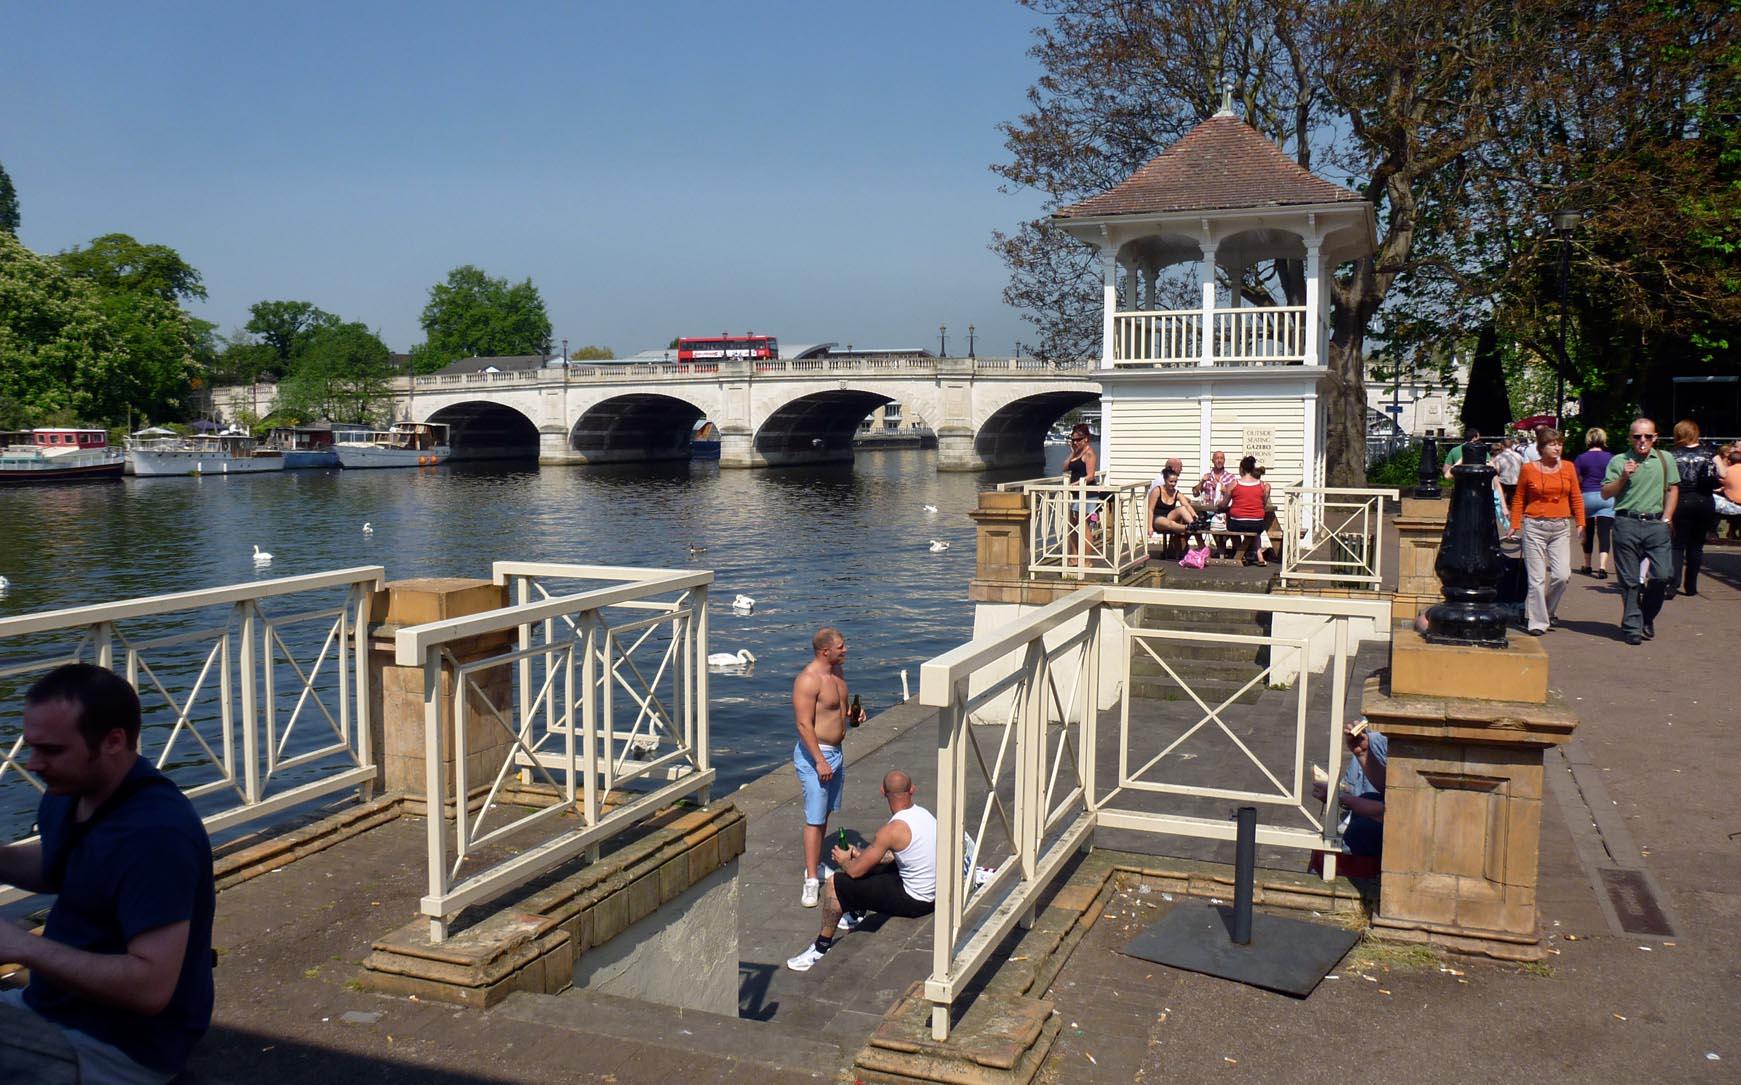 Kingston bridge and railway bridge kingston upon thames for The kingston